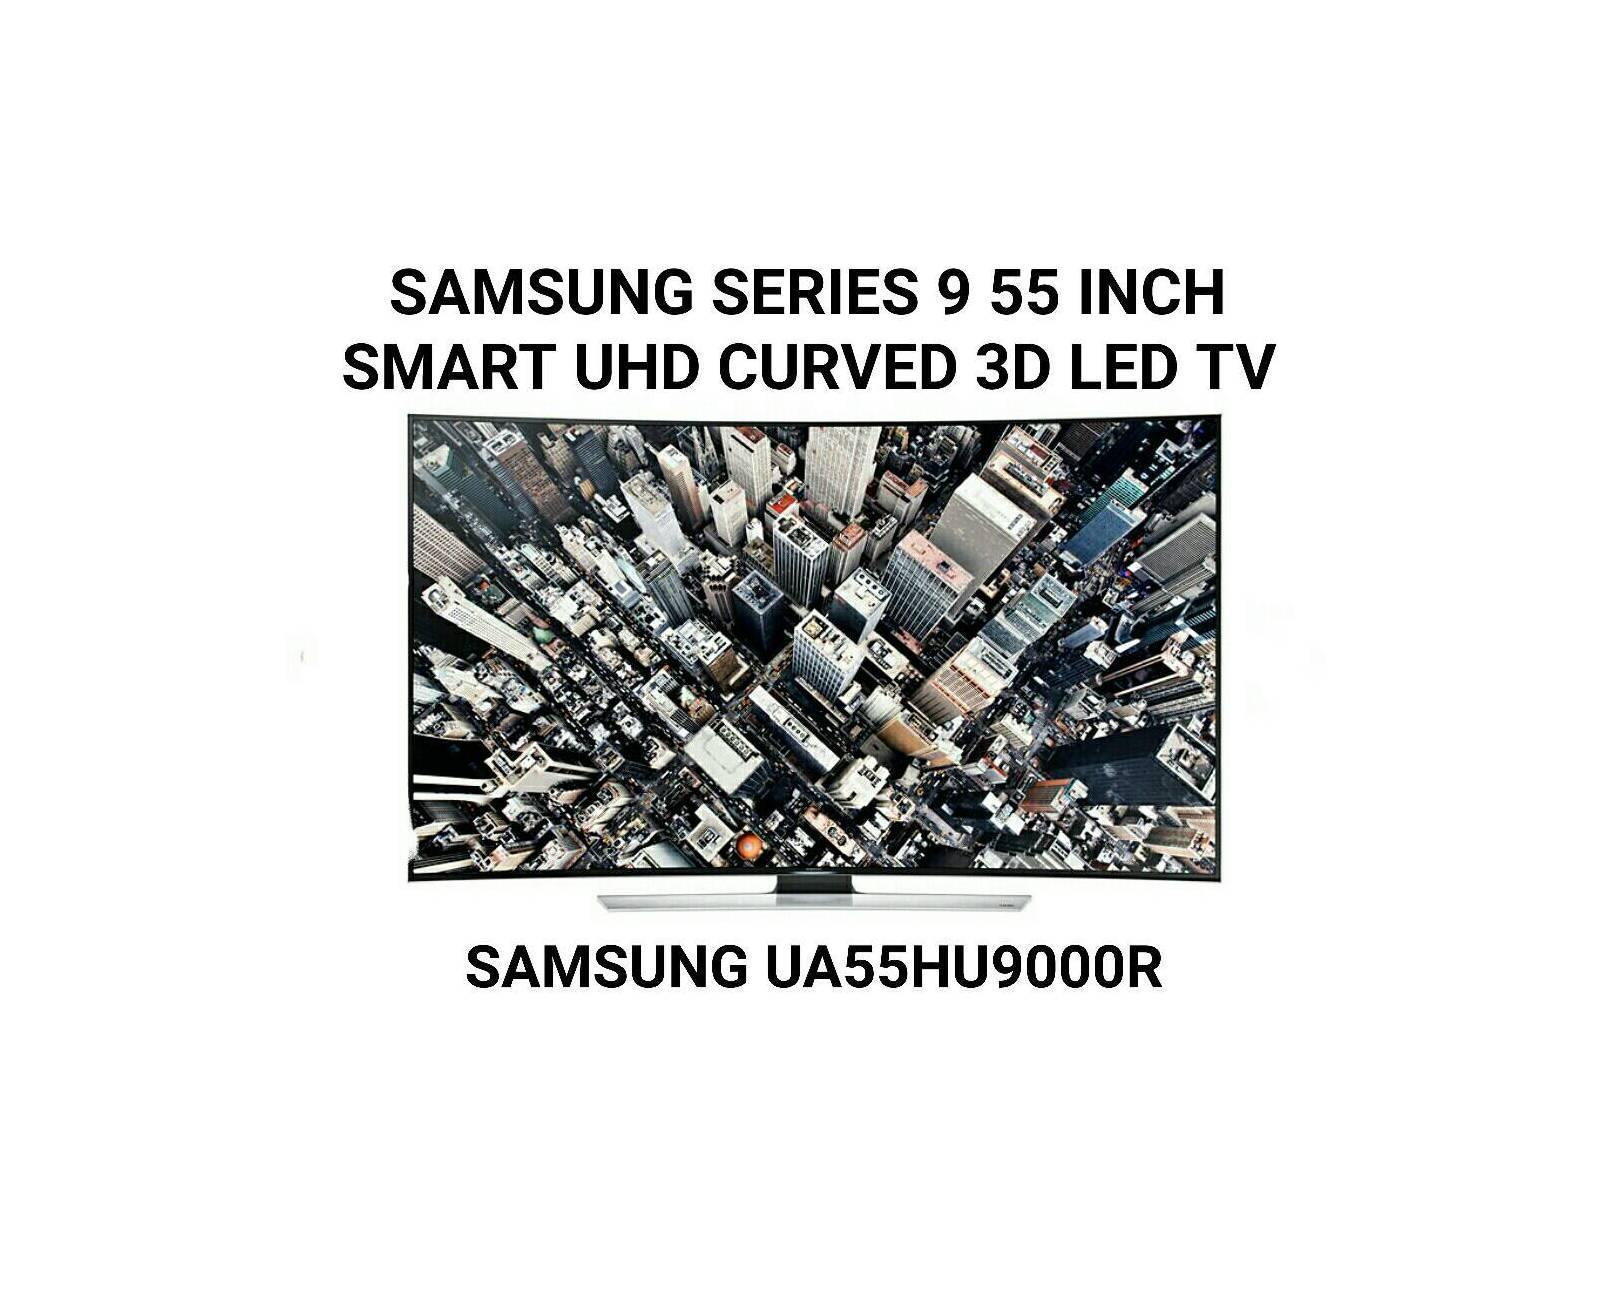 Samsung UA55HU 9000 Series 55 Inch Smart UHD Curved 3D LED TV